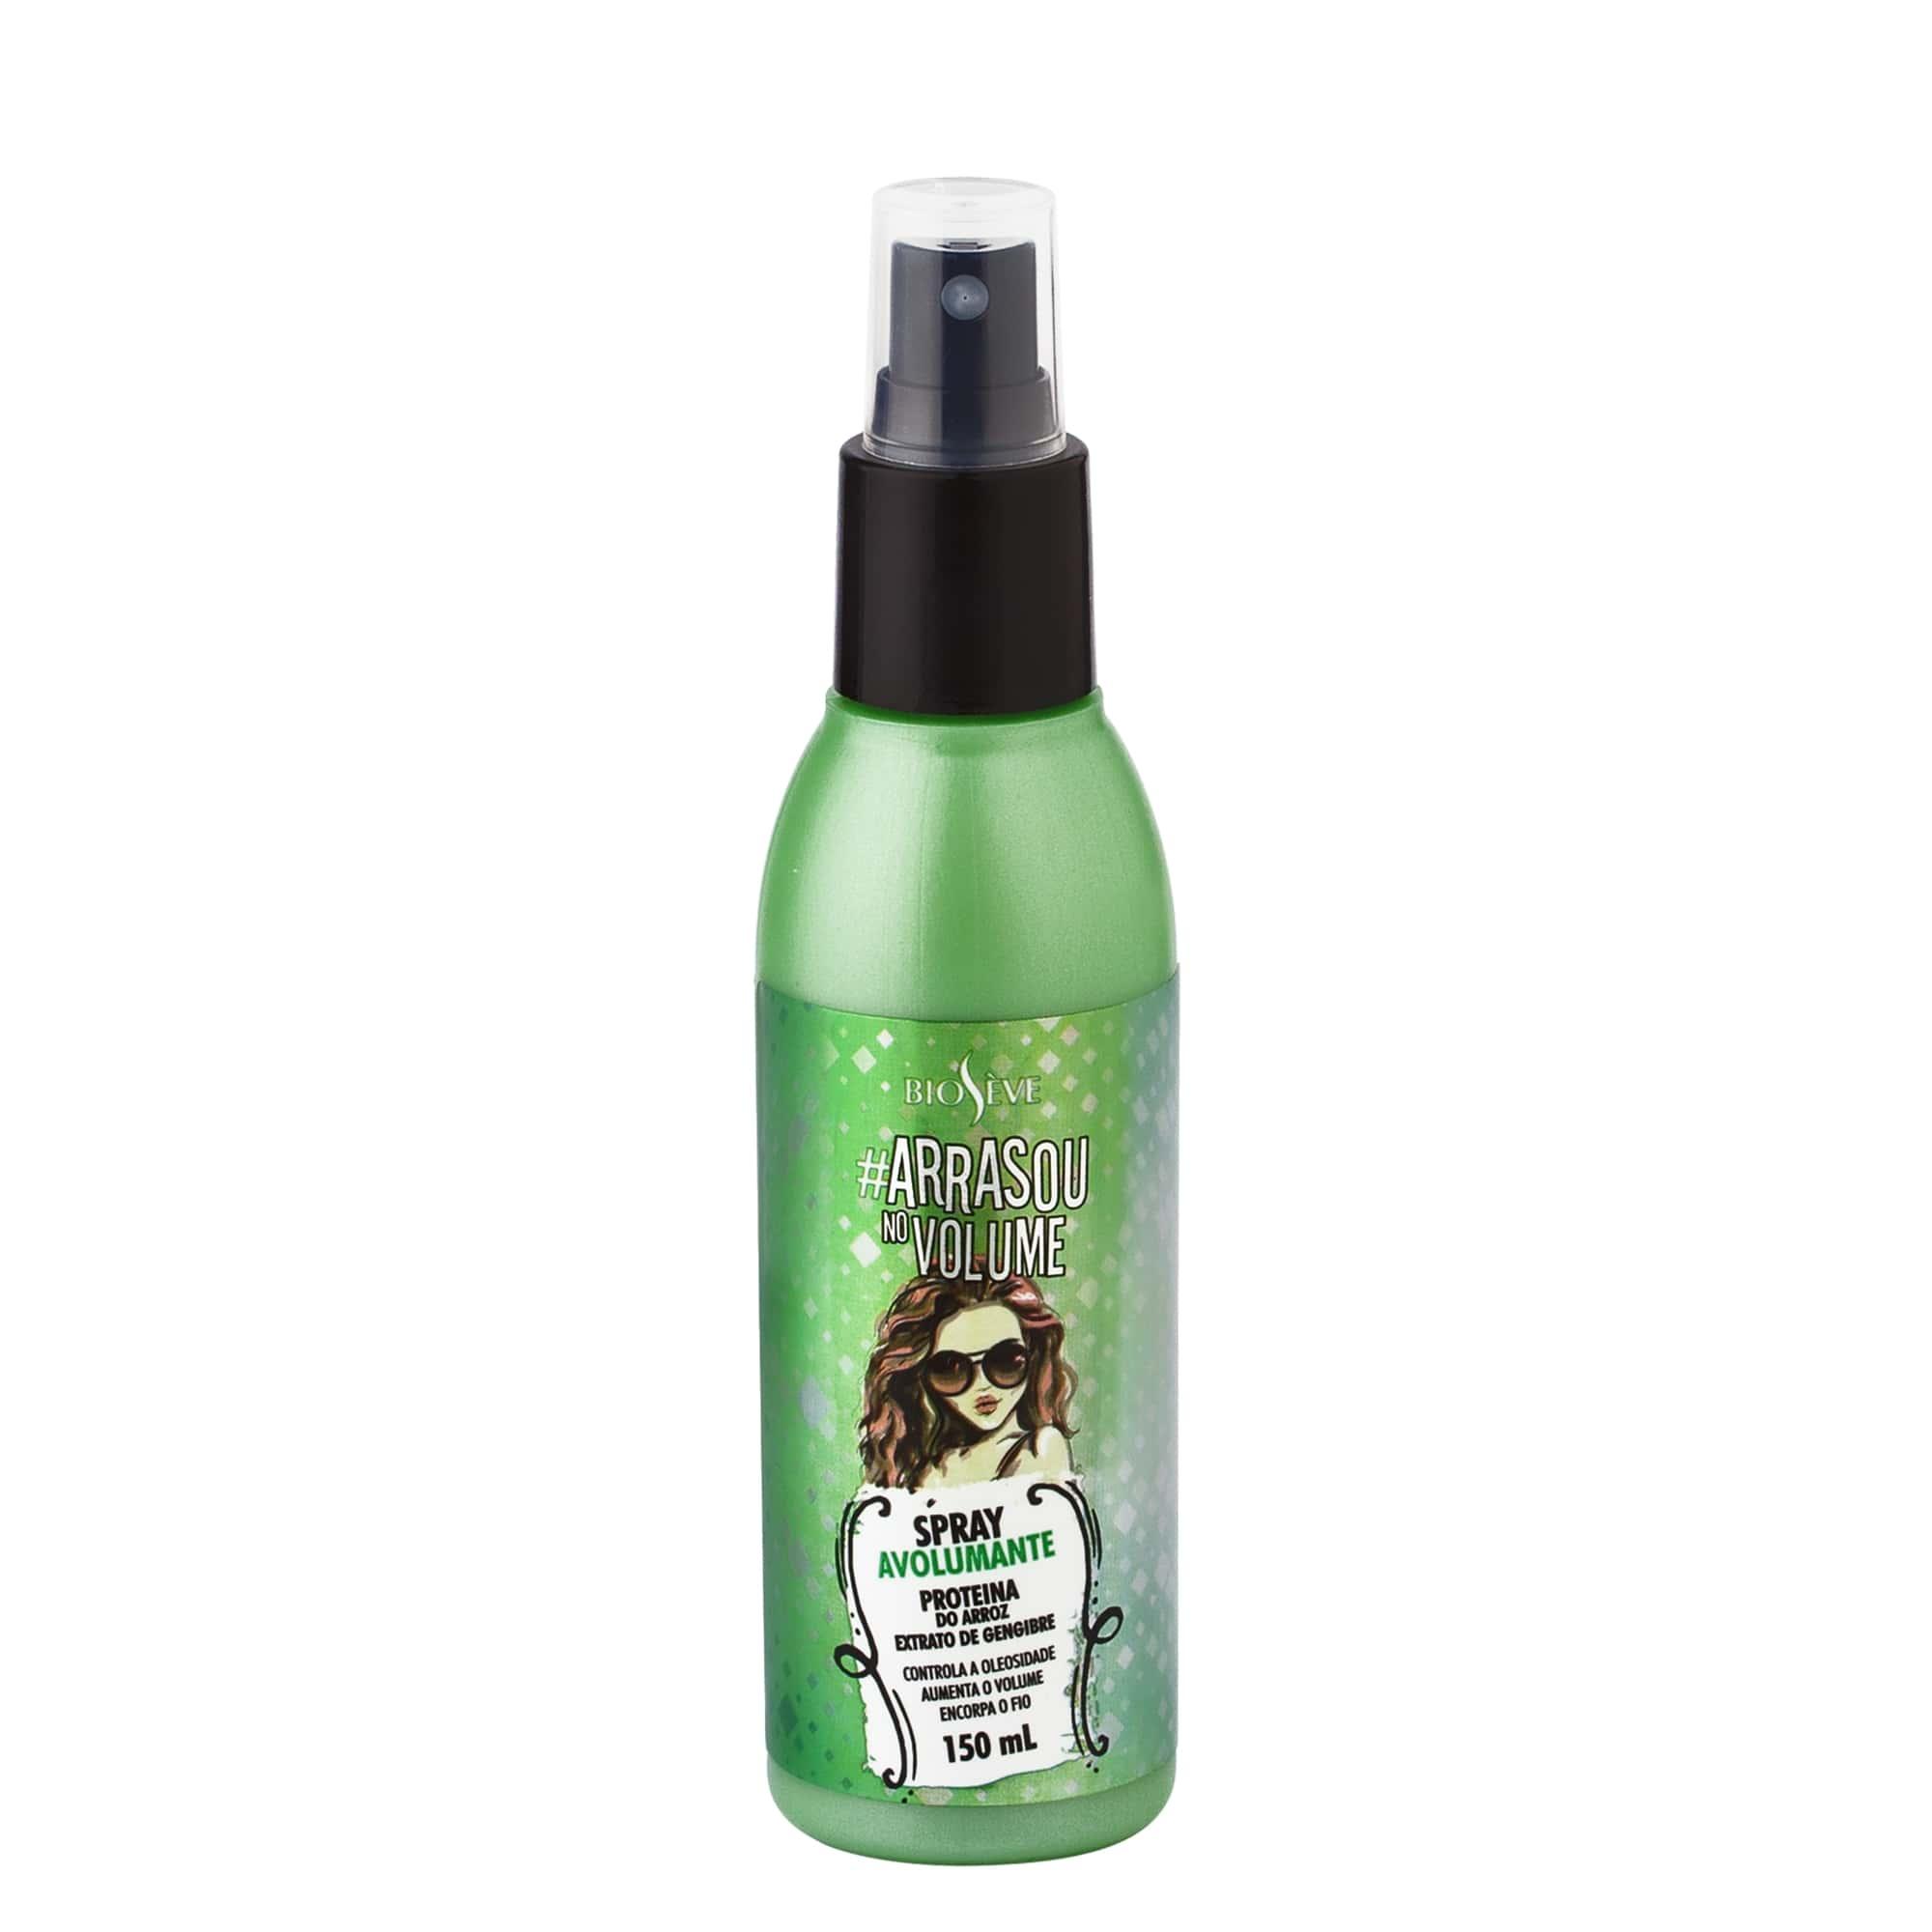 Spray Avolumante Arrasou No Volume Bioseve 150ml